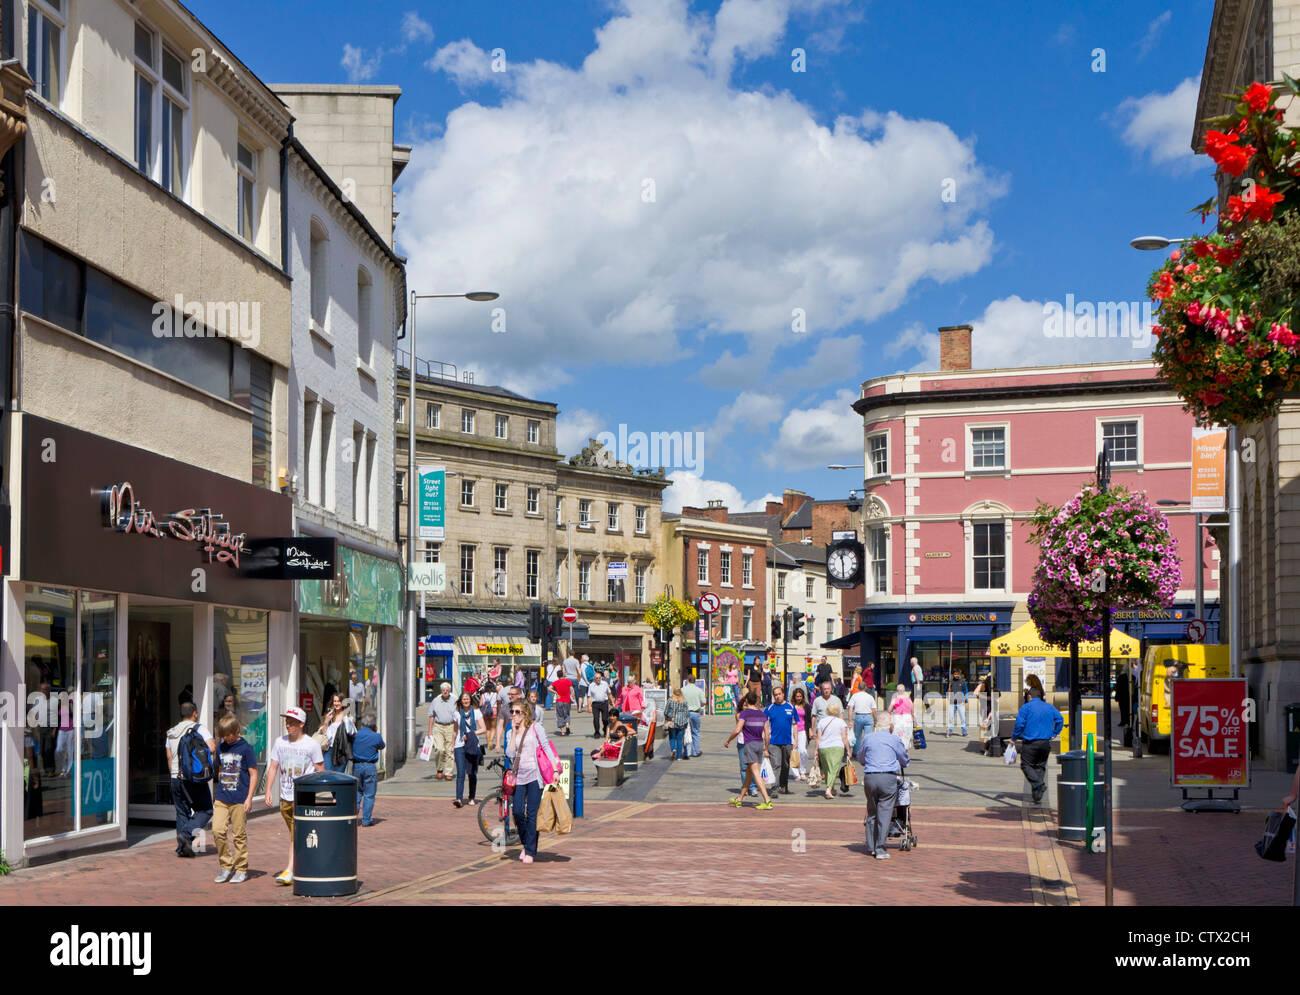 Corn Market, Derby City Centre, Derbyshire, England, UK, EU, Europe - Stock Image